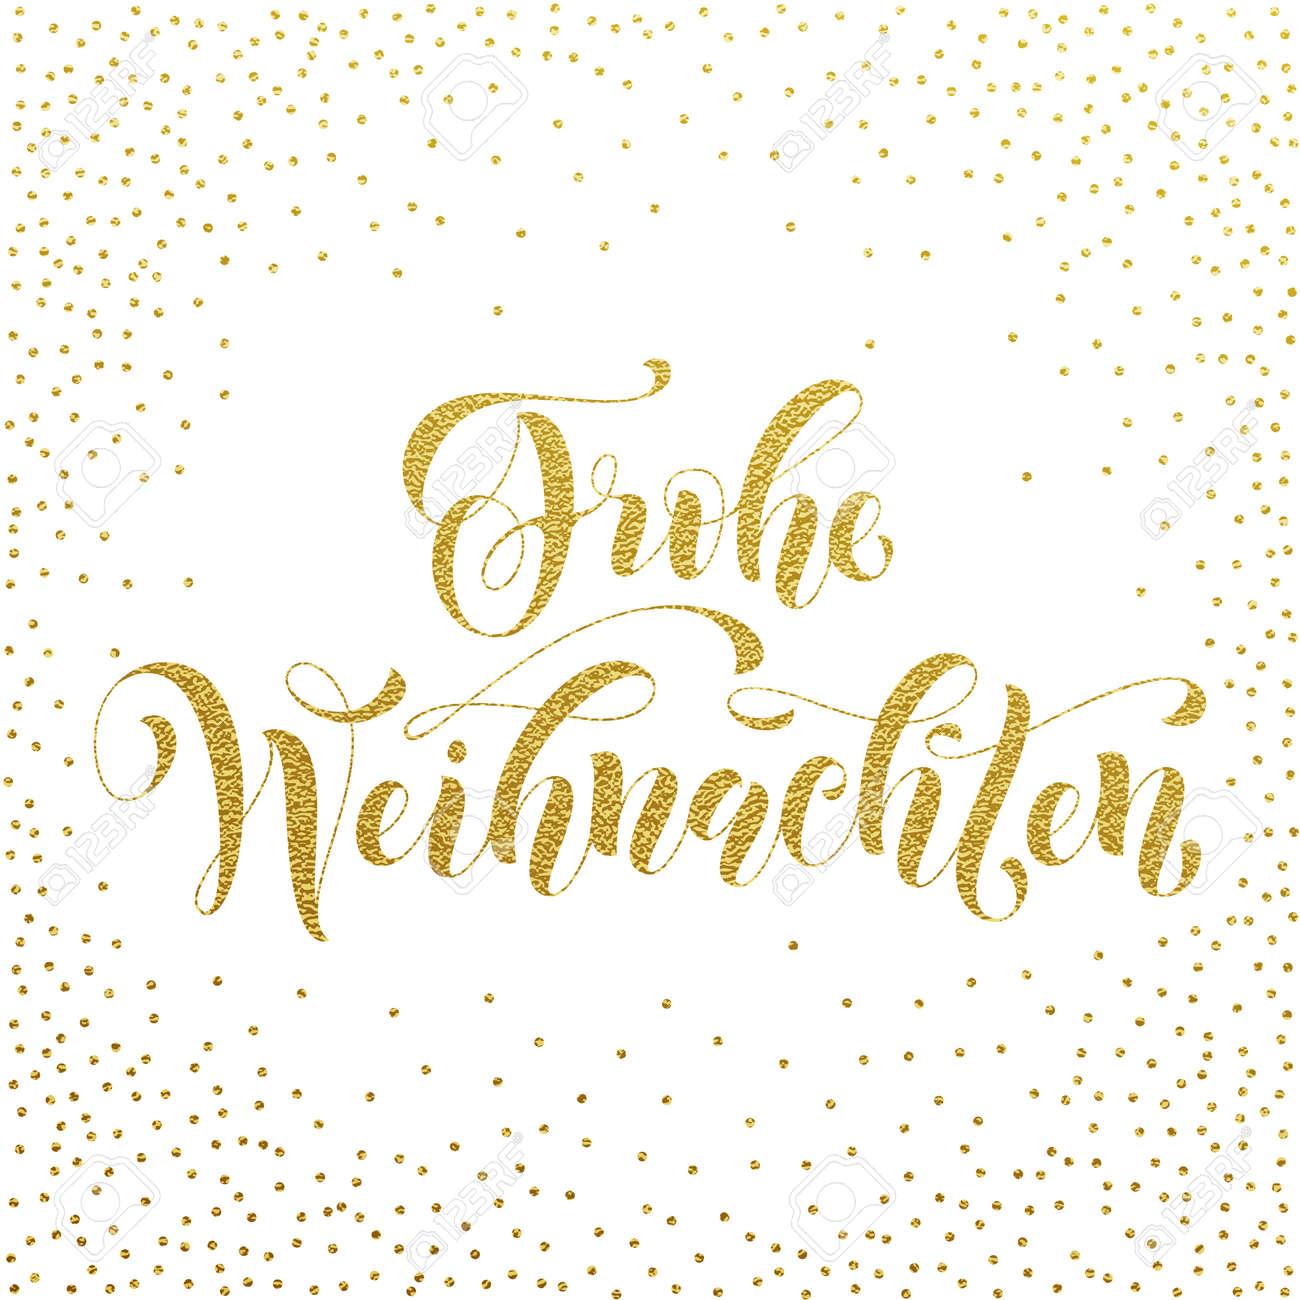 Frohe Weihnachten Text.Frohe Weihnachten German Christmas Gold Glitter Lettering For